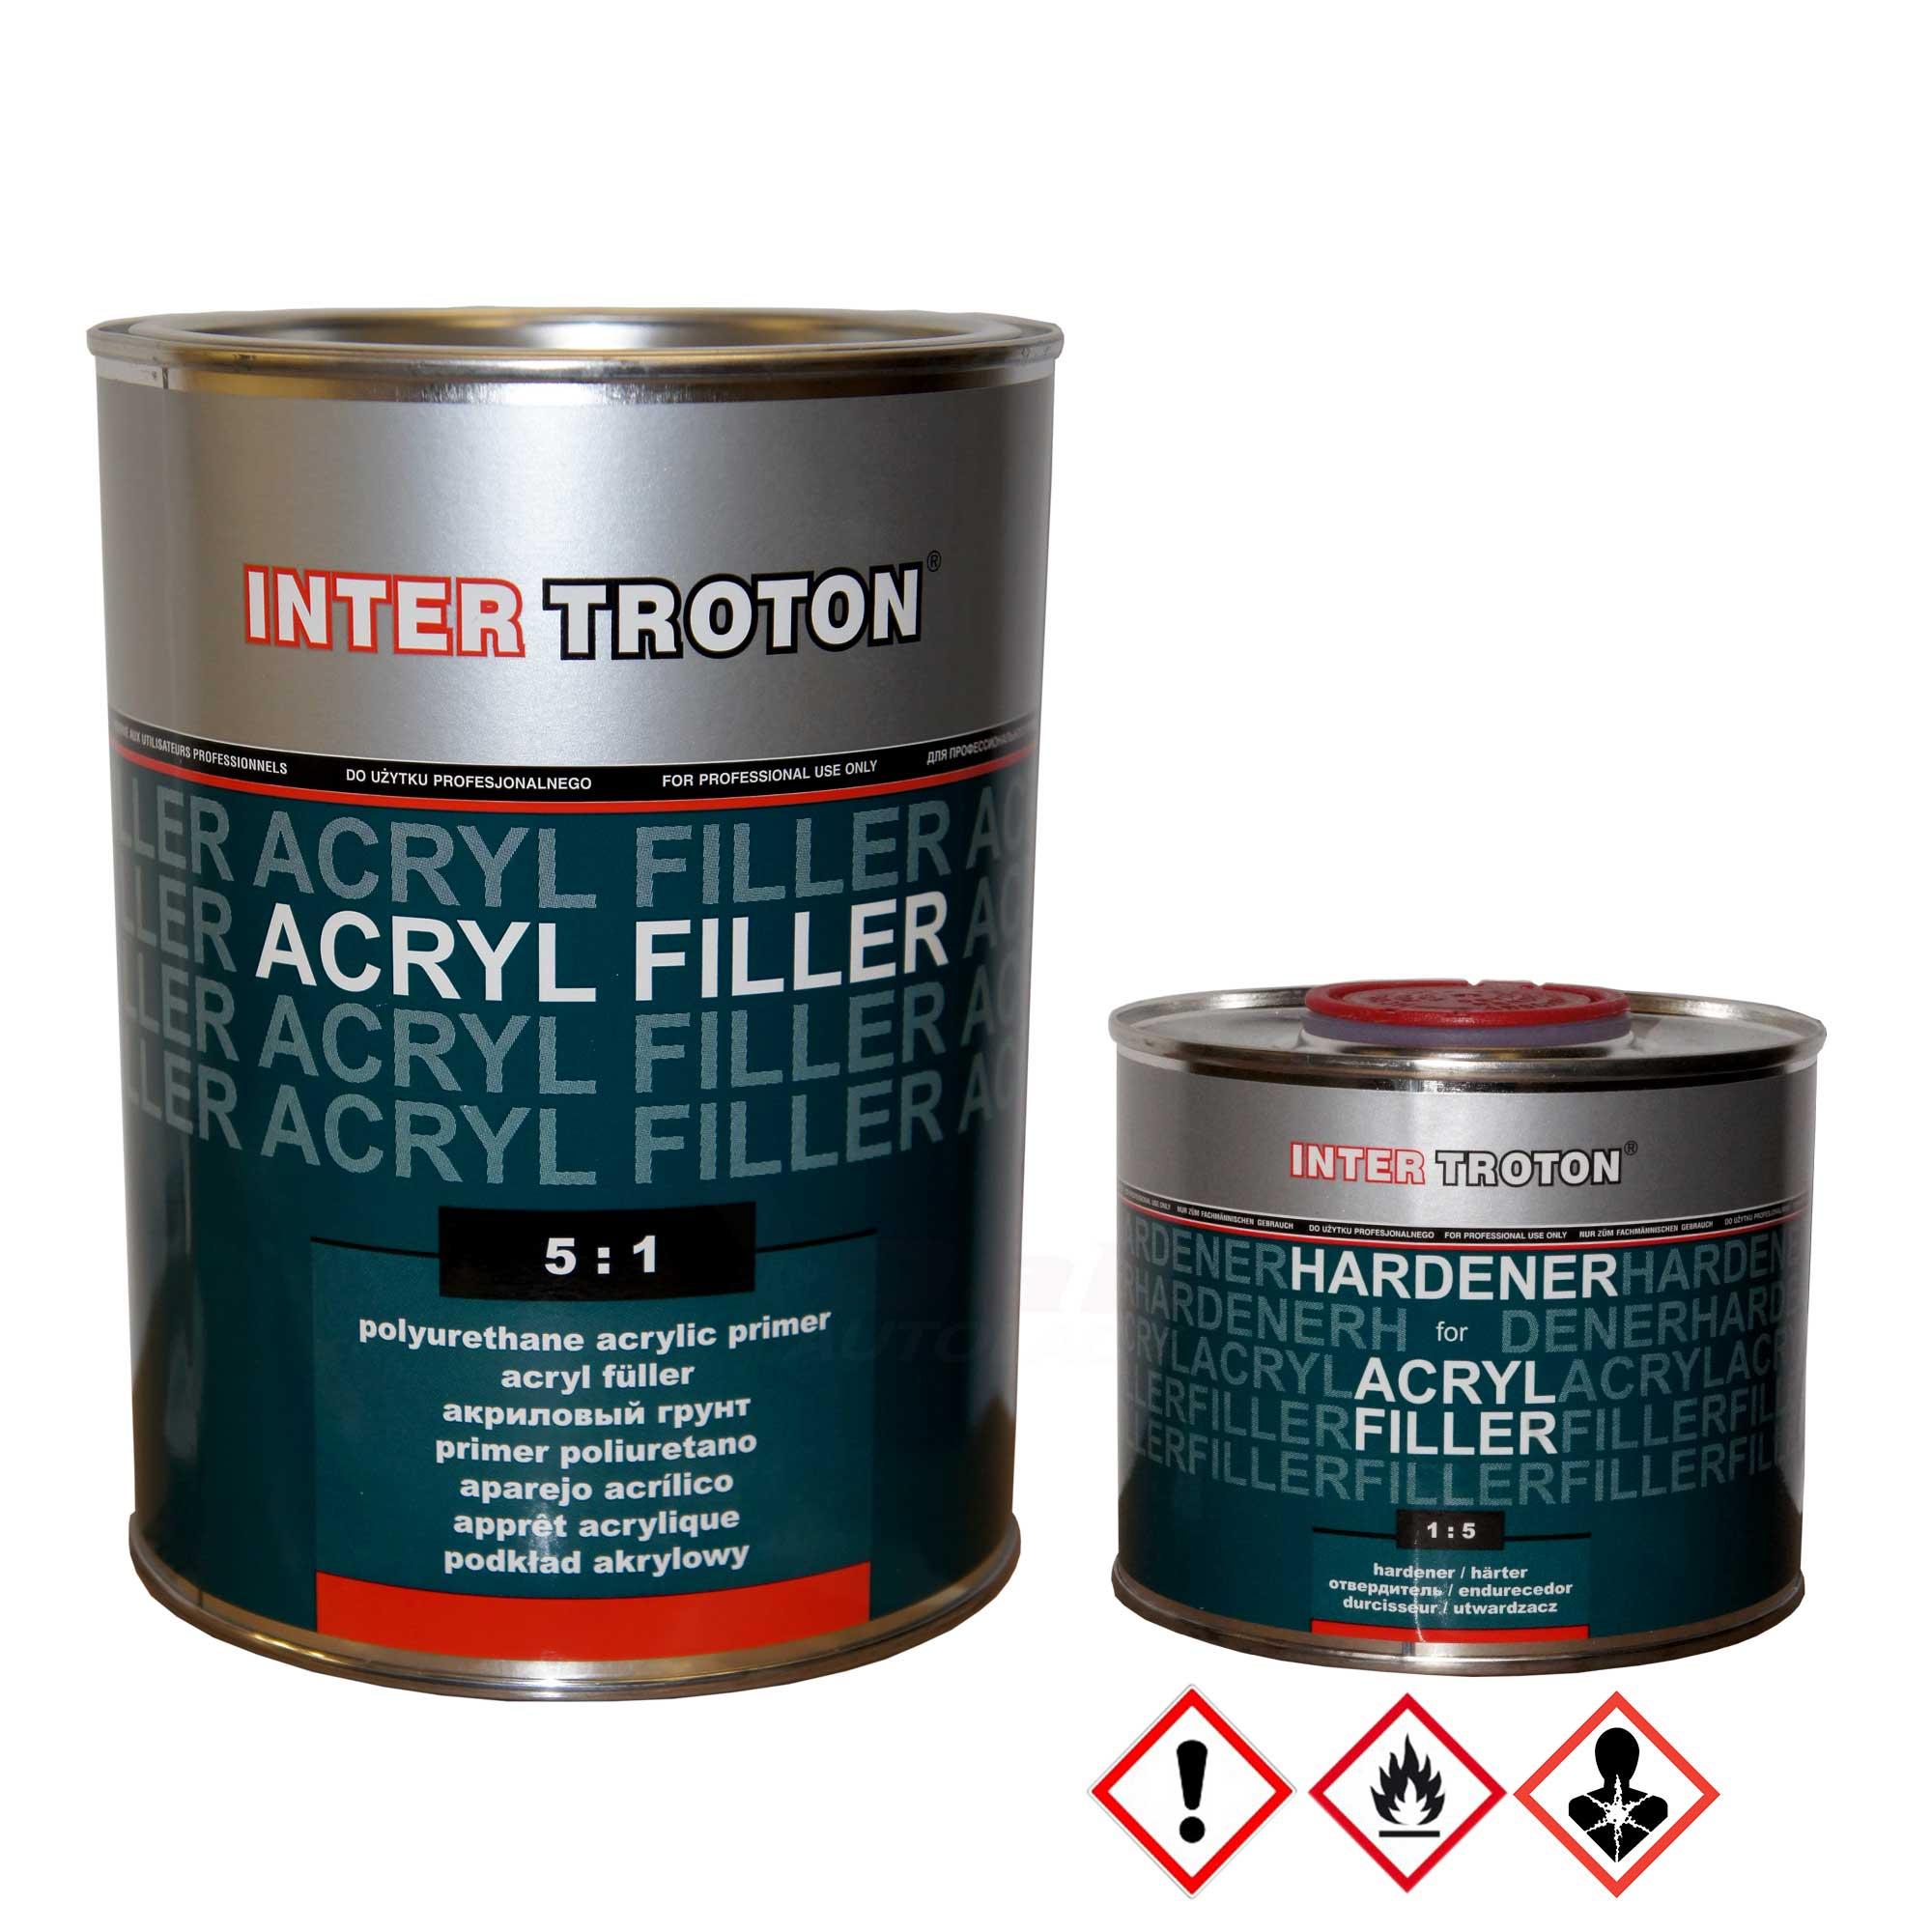 inter troton 2k hs acryl füller | dab autolack - dab-autolack shop